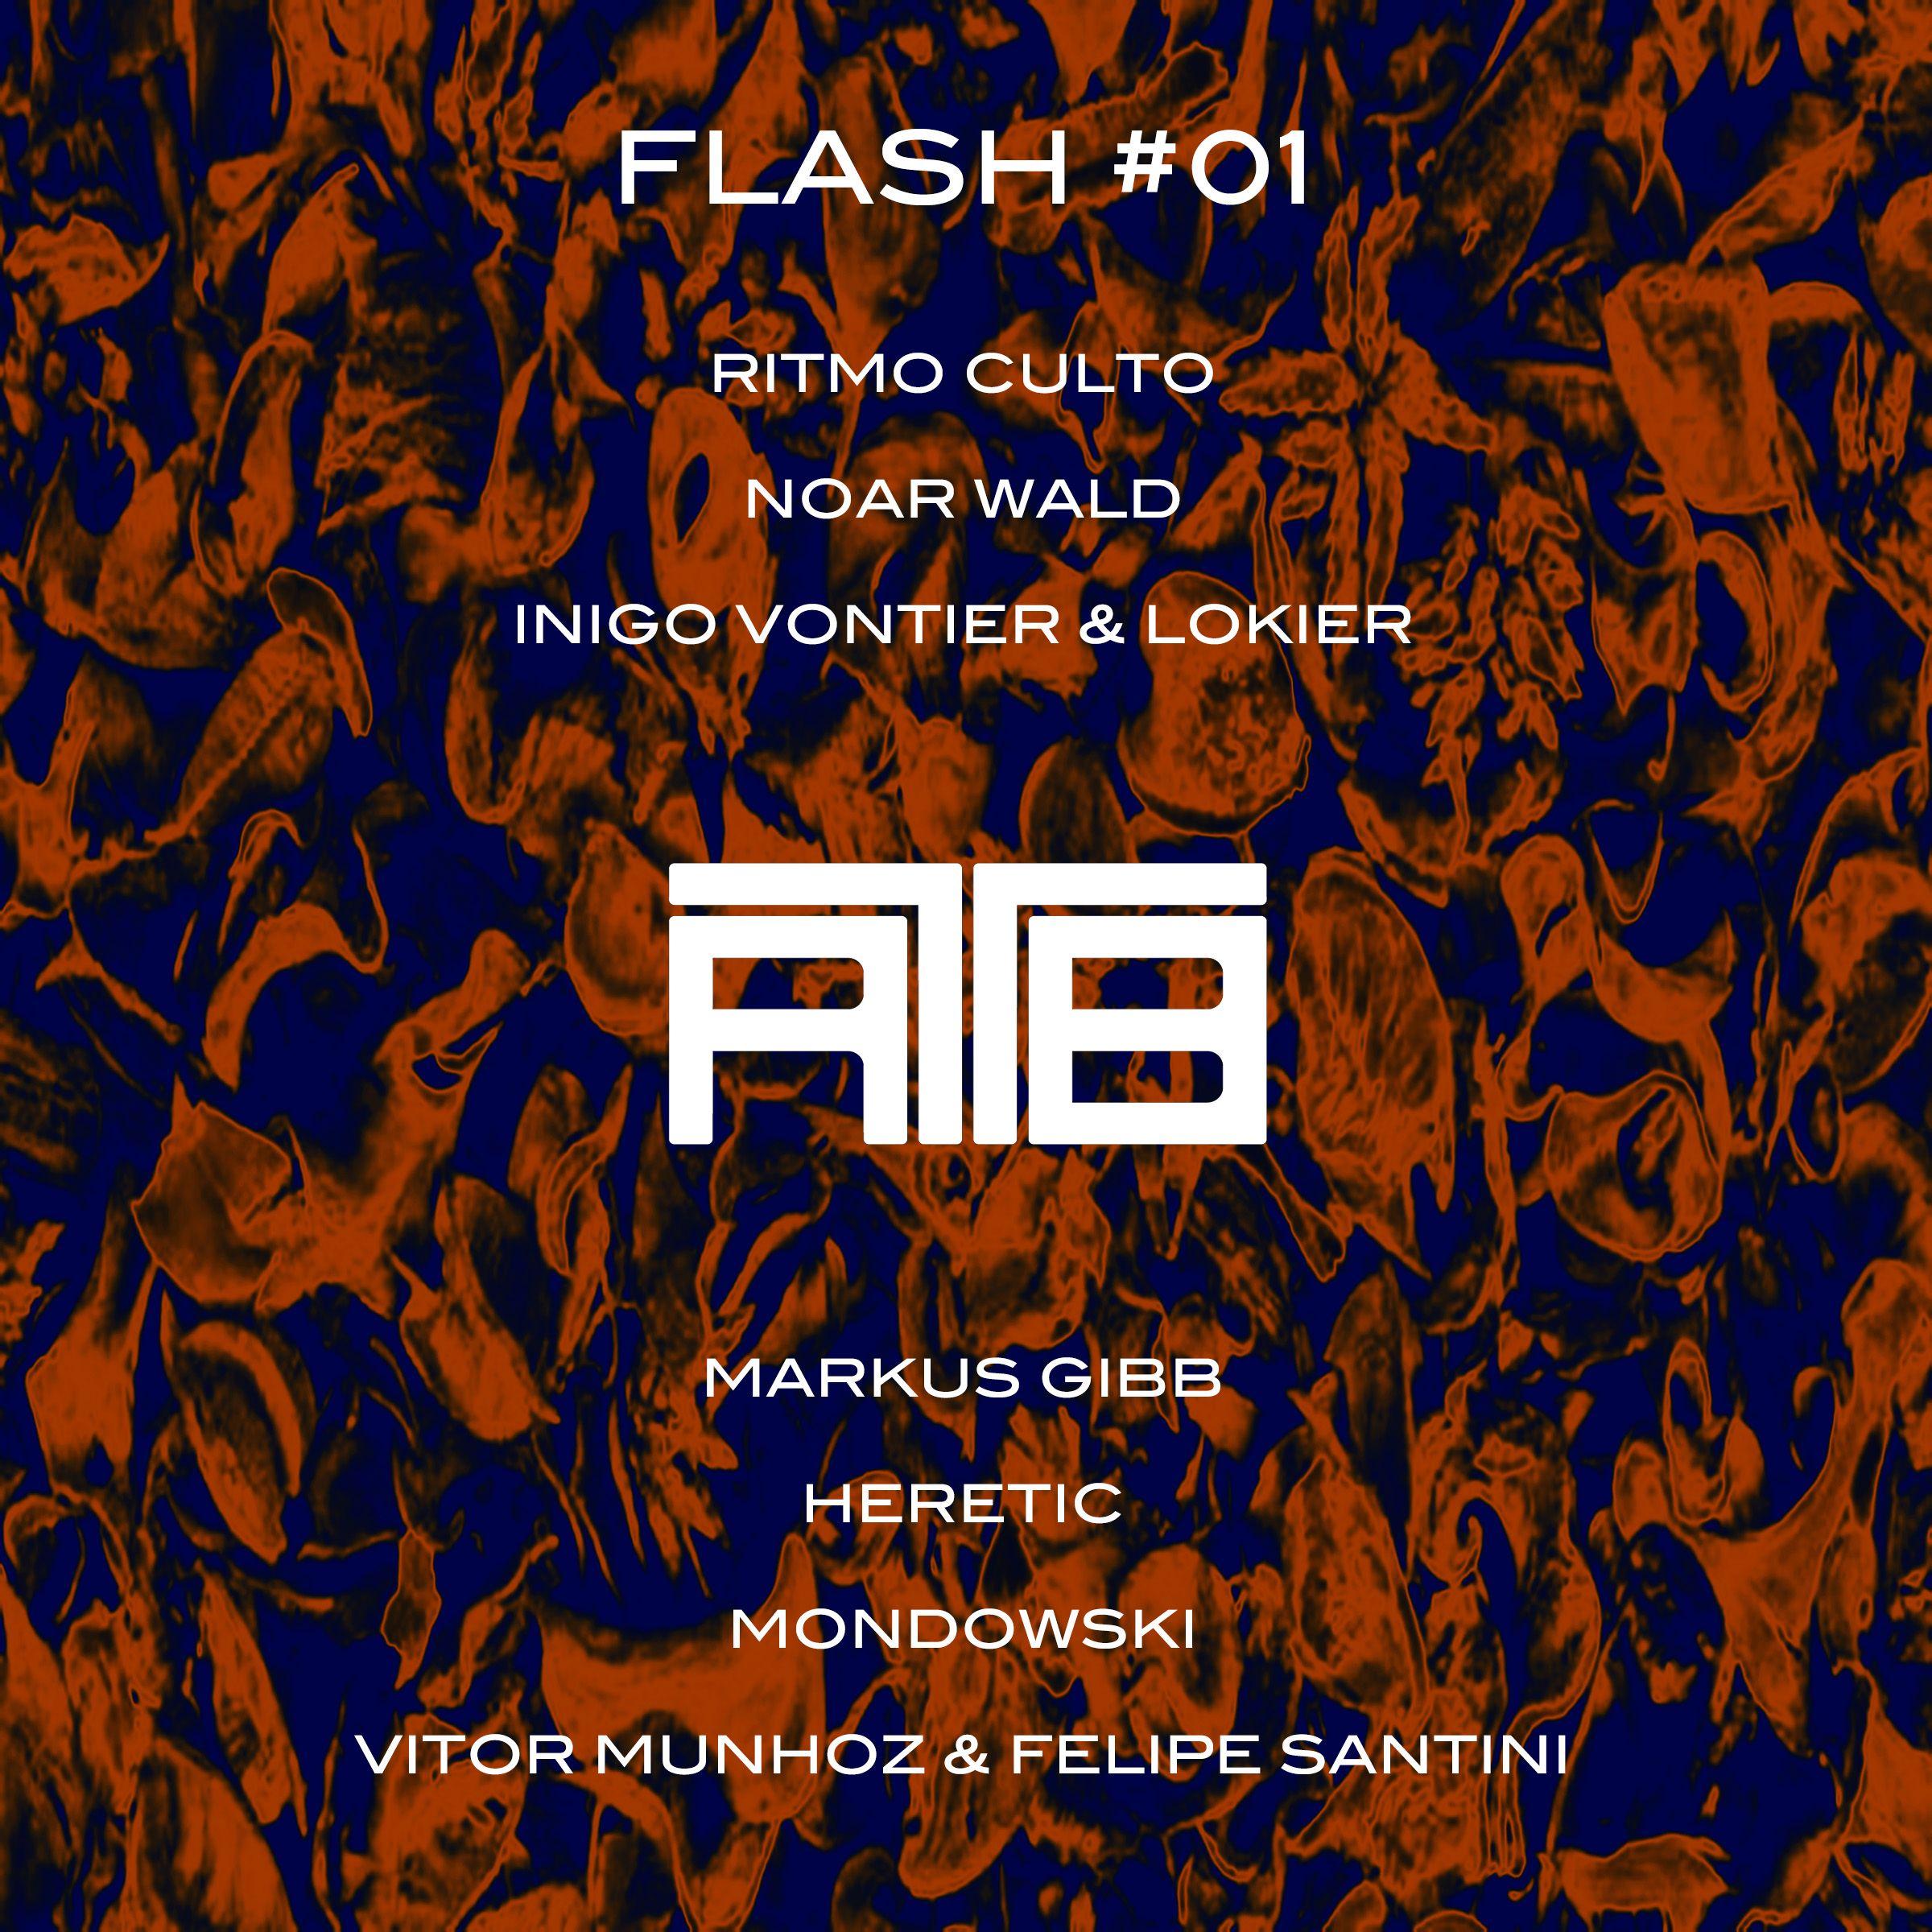 rttb021_-_flash_01_-_cover.jpg